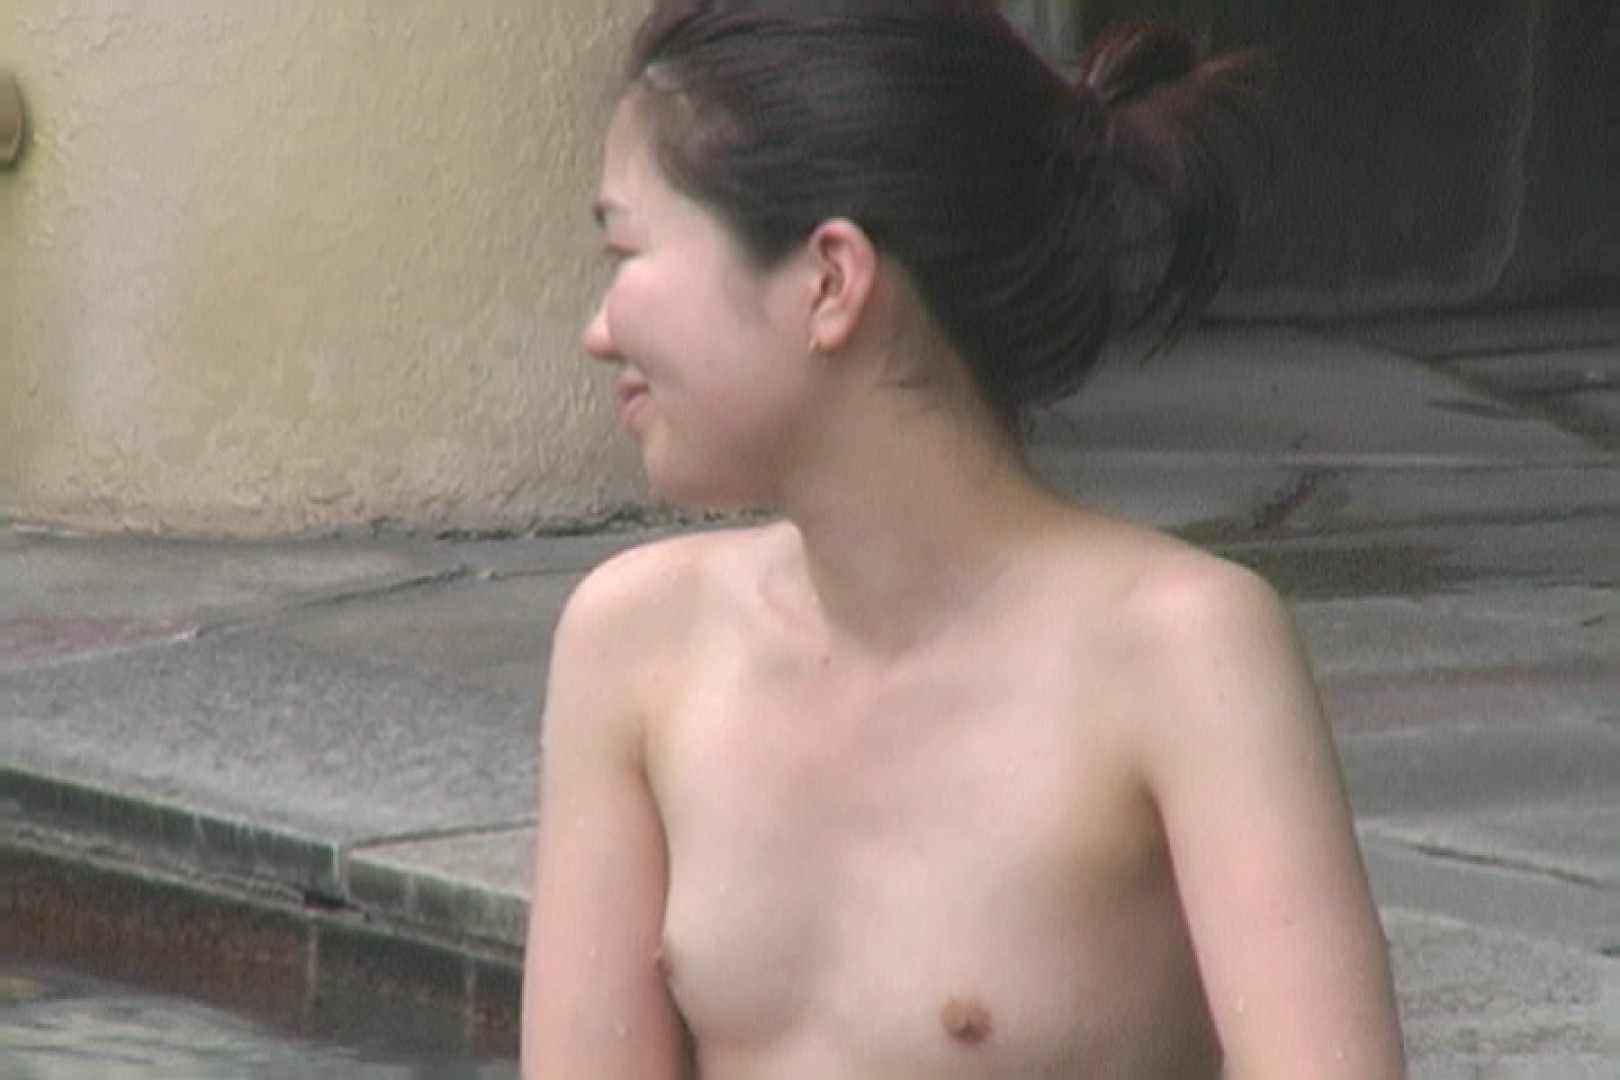 Aquaな露天風呂Vol.641 盗撮師作品  97pic 21